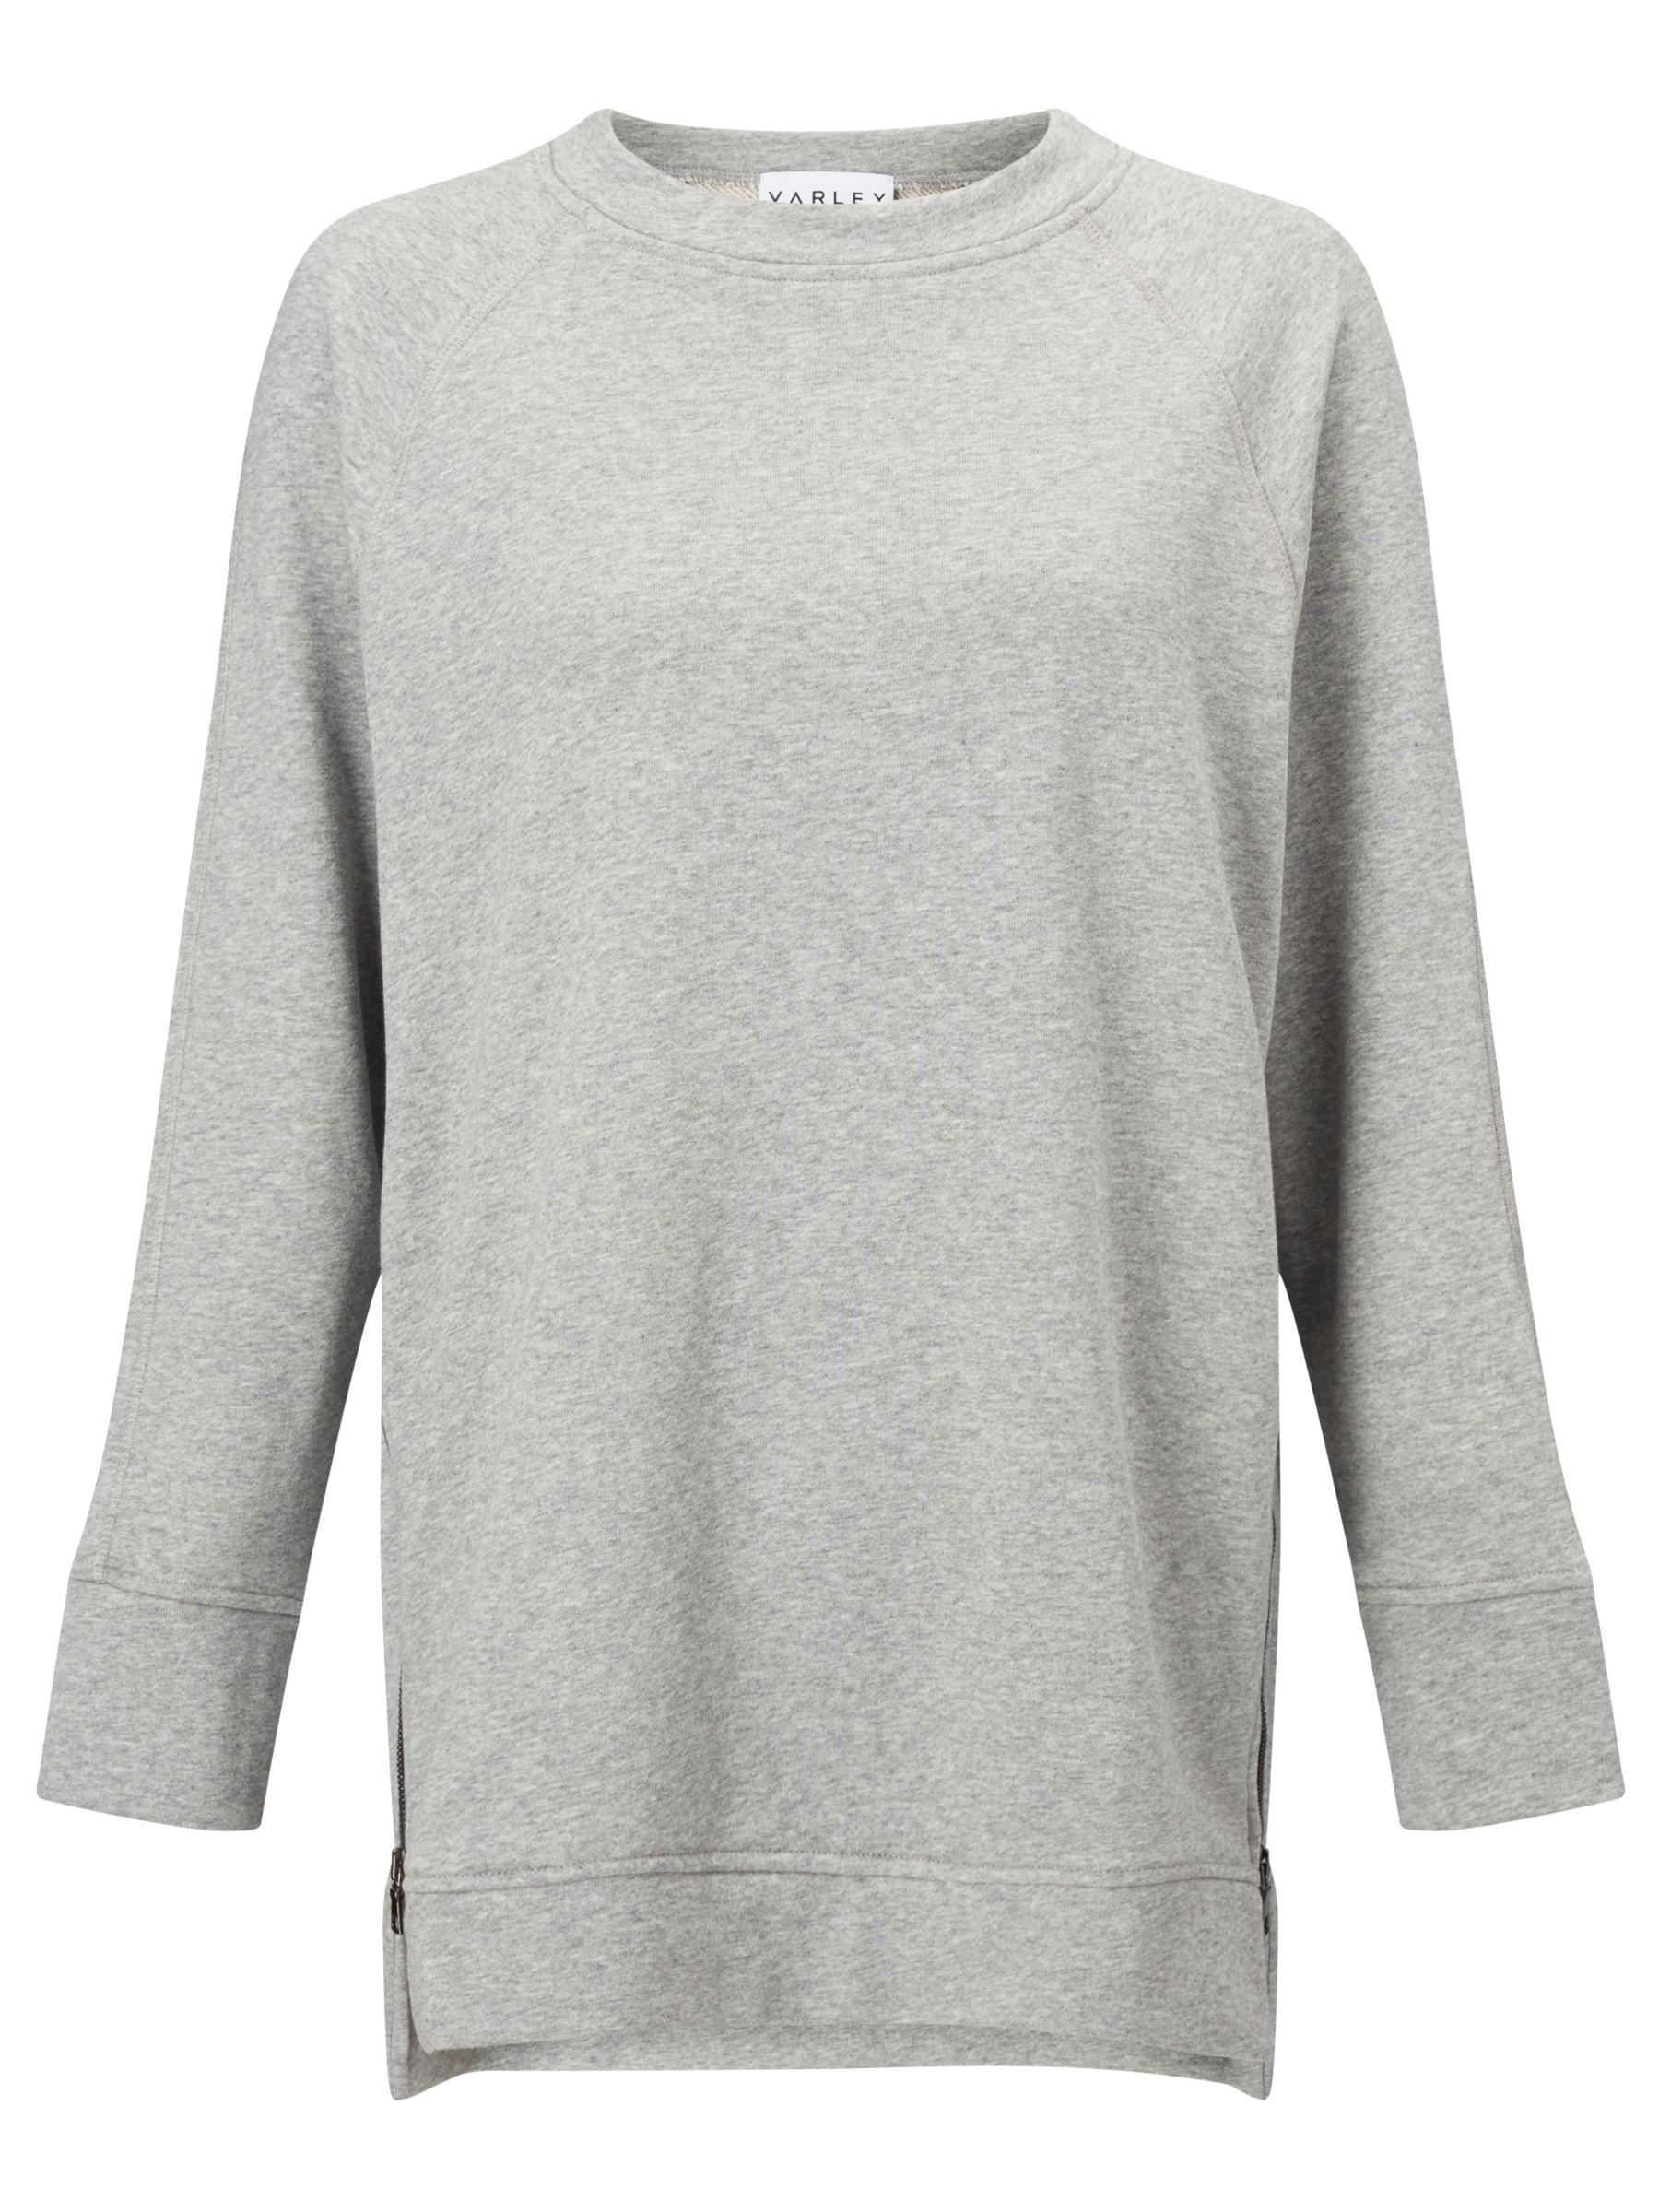 Varley Varley Manning Sweatshirt, Grey